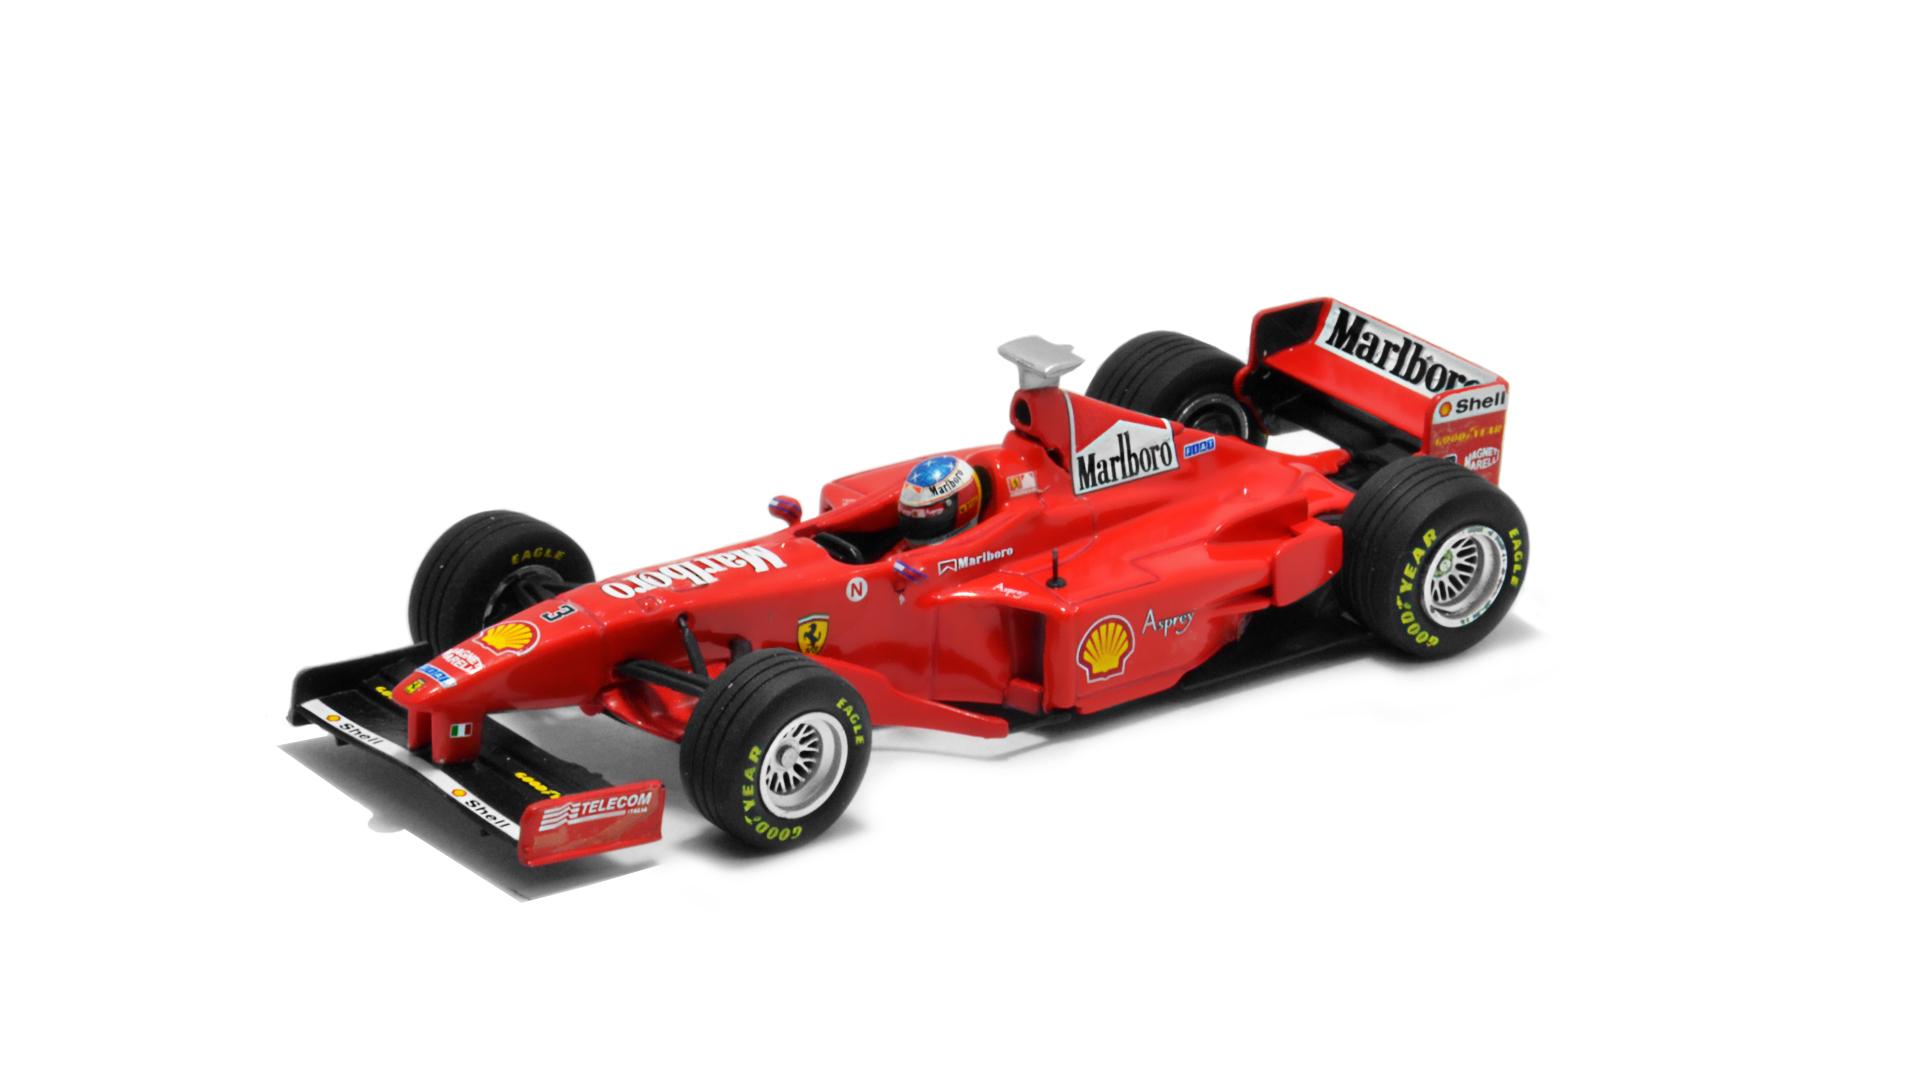 Év: 1998<br />Modell: F300<br />Gyártó: Minichamps<br />Pilóta: Michael Schumacher